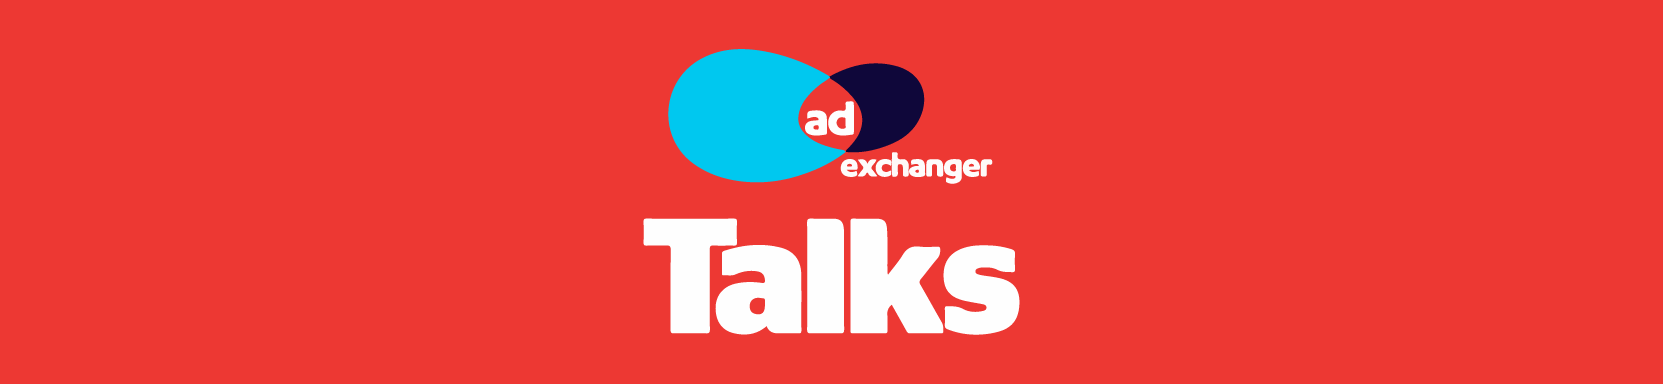 AdExchanger Advertising Marketing Podcast